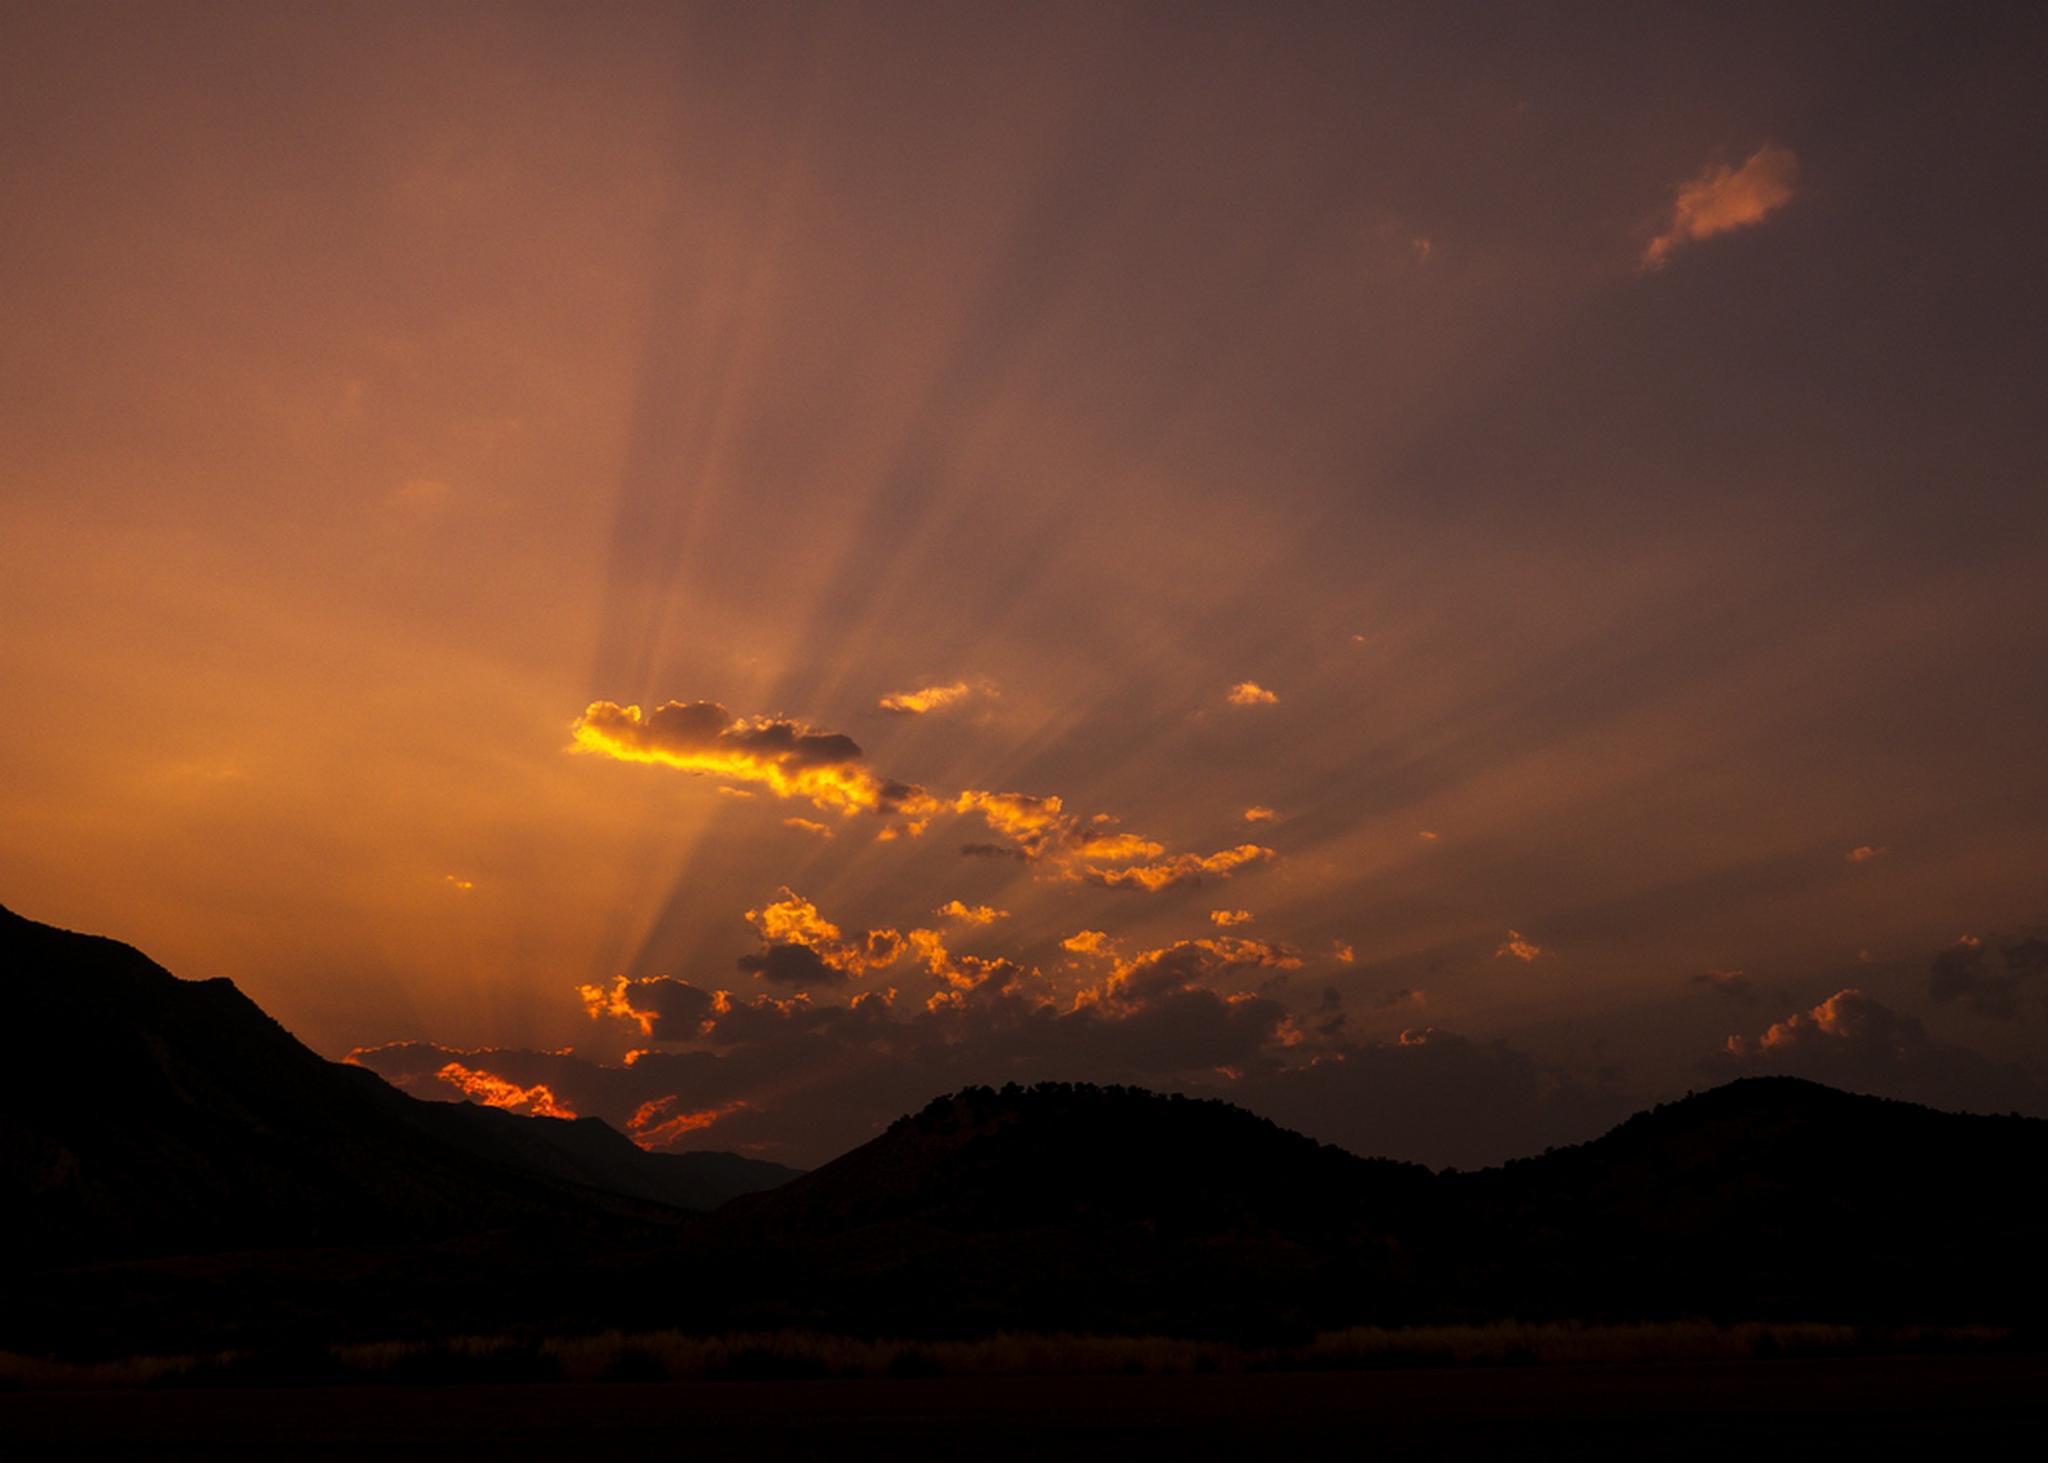 Rays of Glory by jeannie jay martin